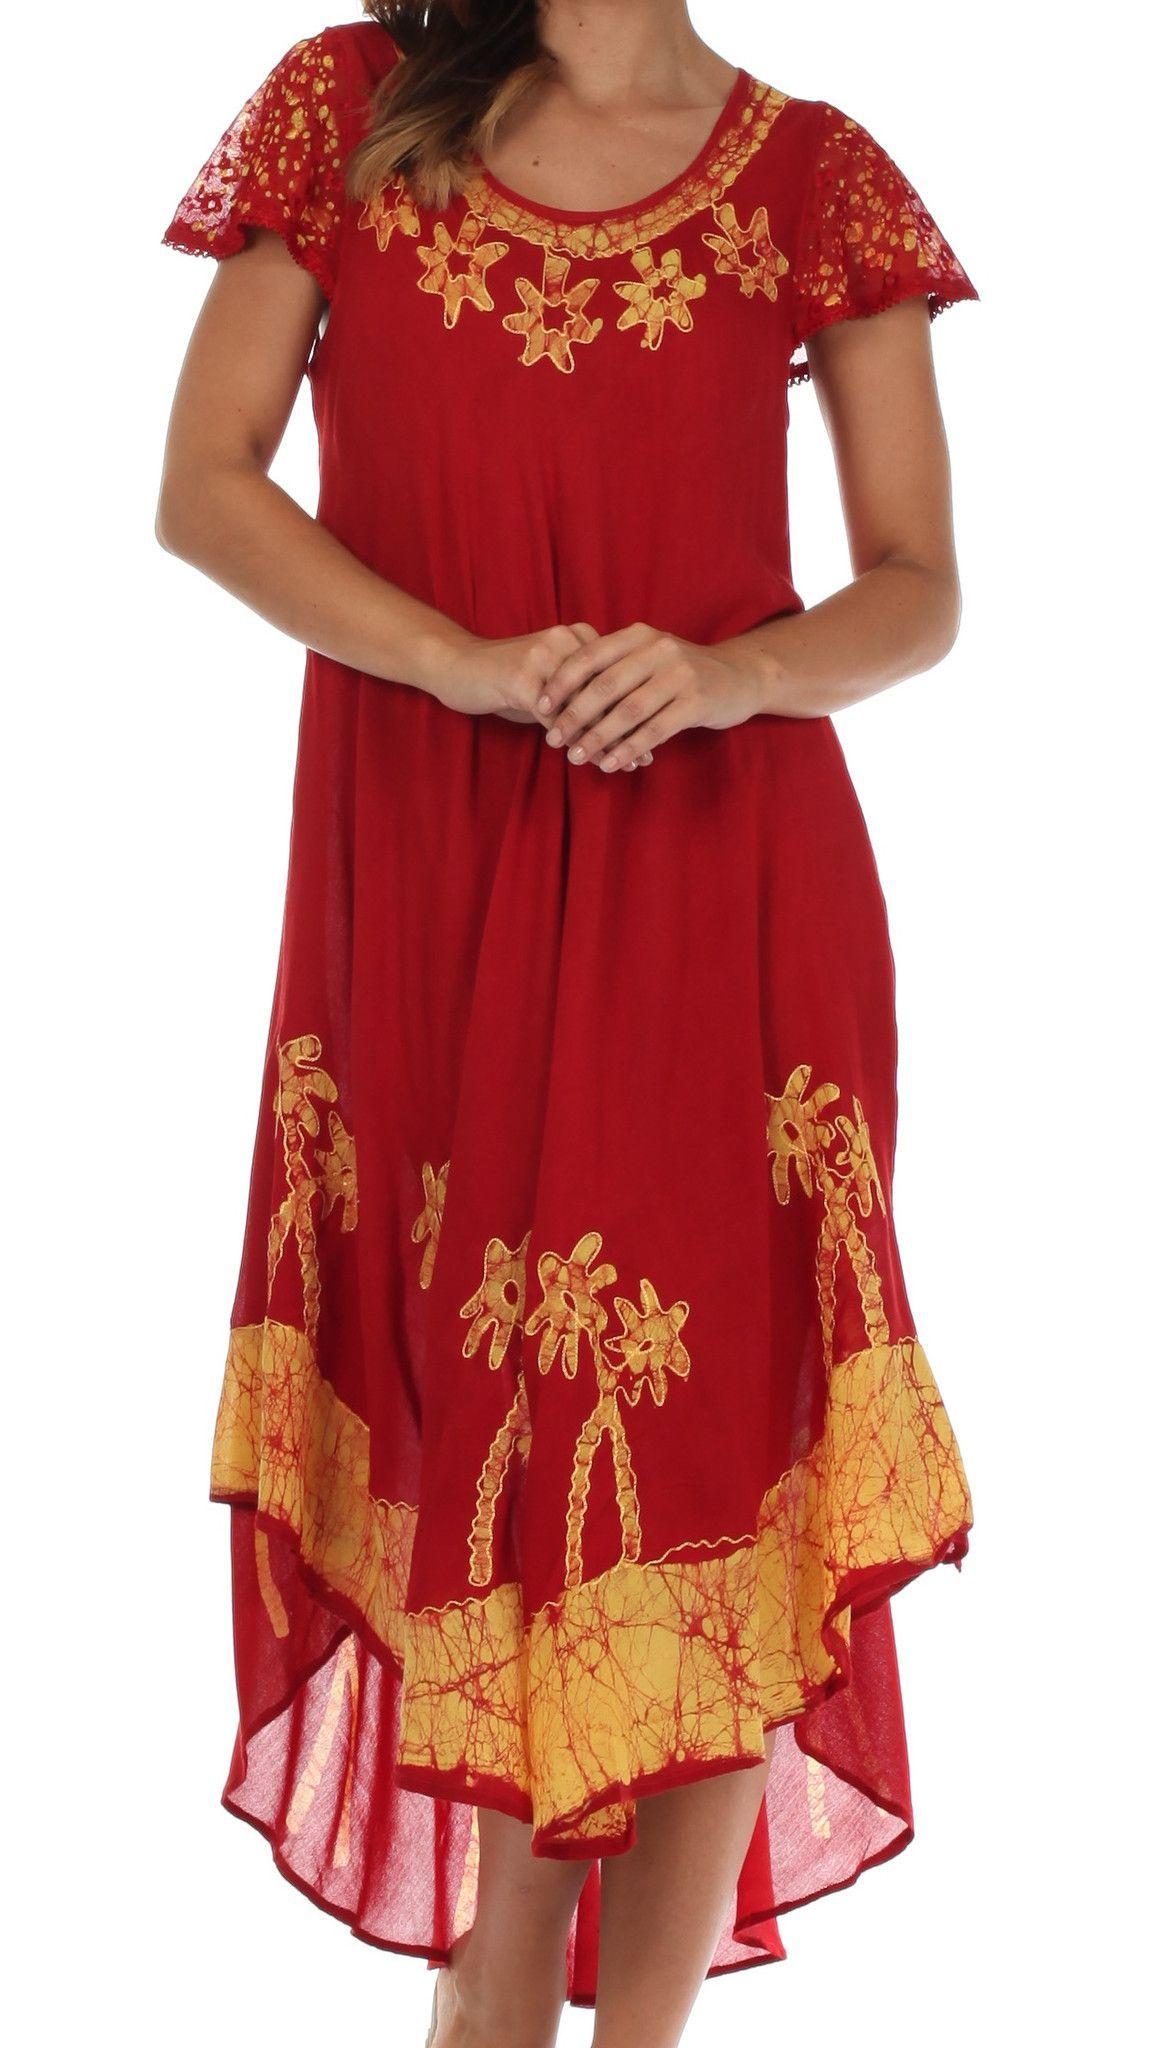 Sakkas Batik Palm Tree Cap Sleeve Caftan Dress Cover Up